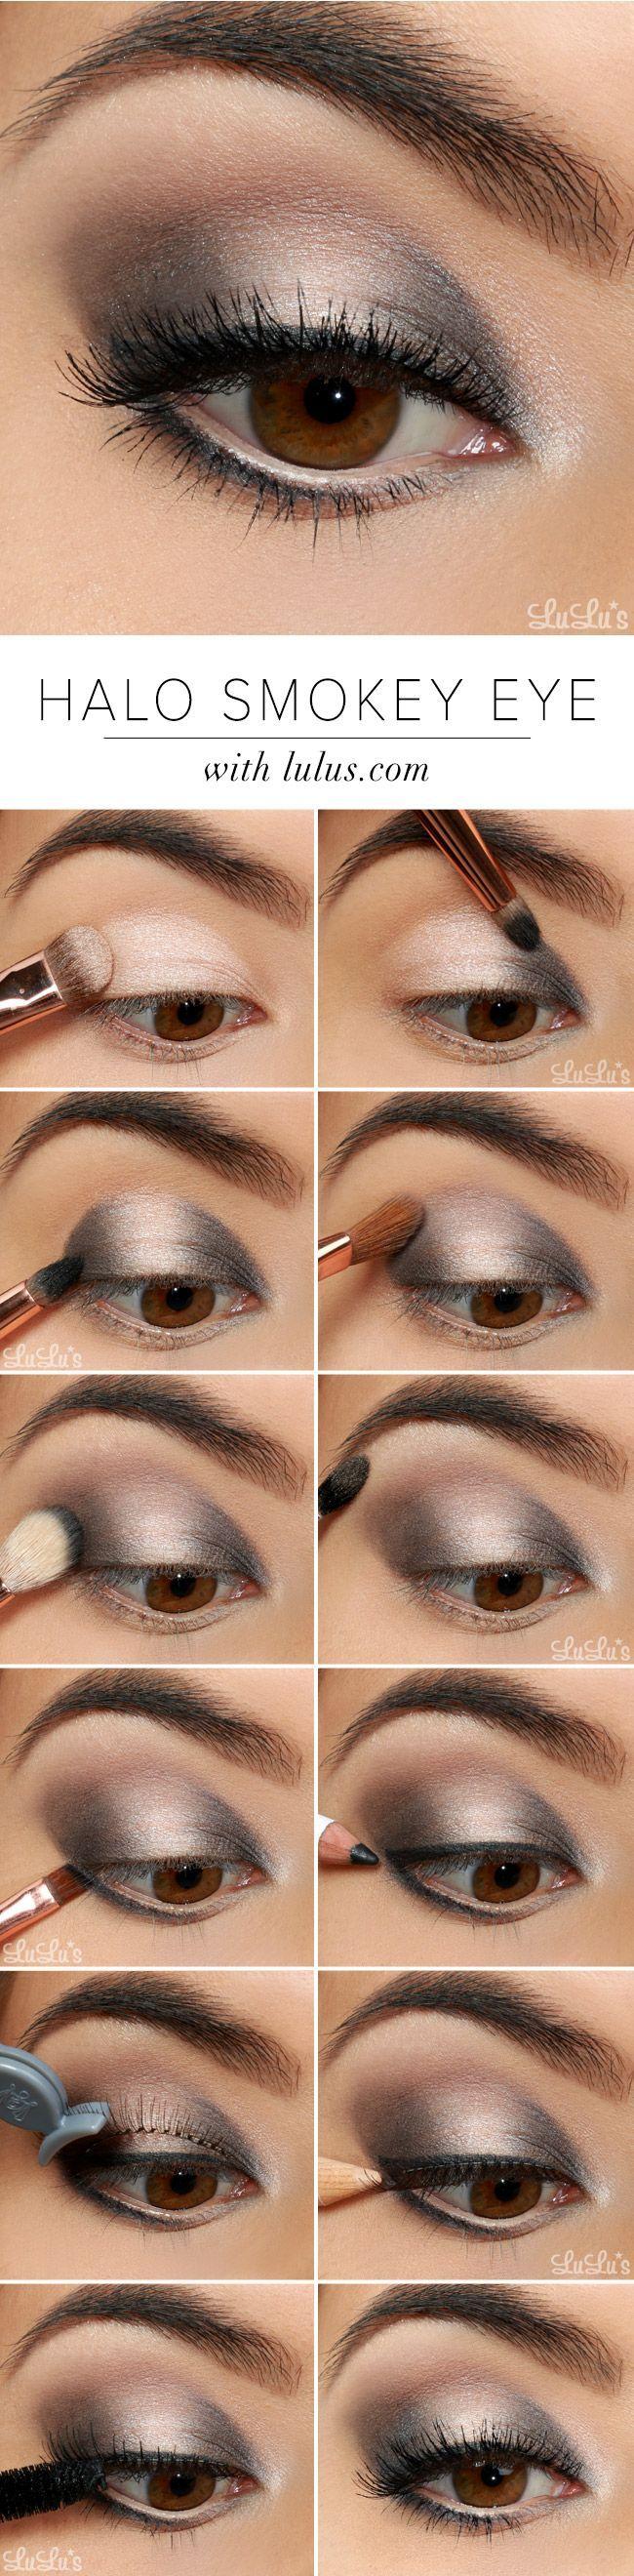 LuLu*s How-To: Halo Smokey Eye Shadow Tutorial at LuLus.com!